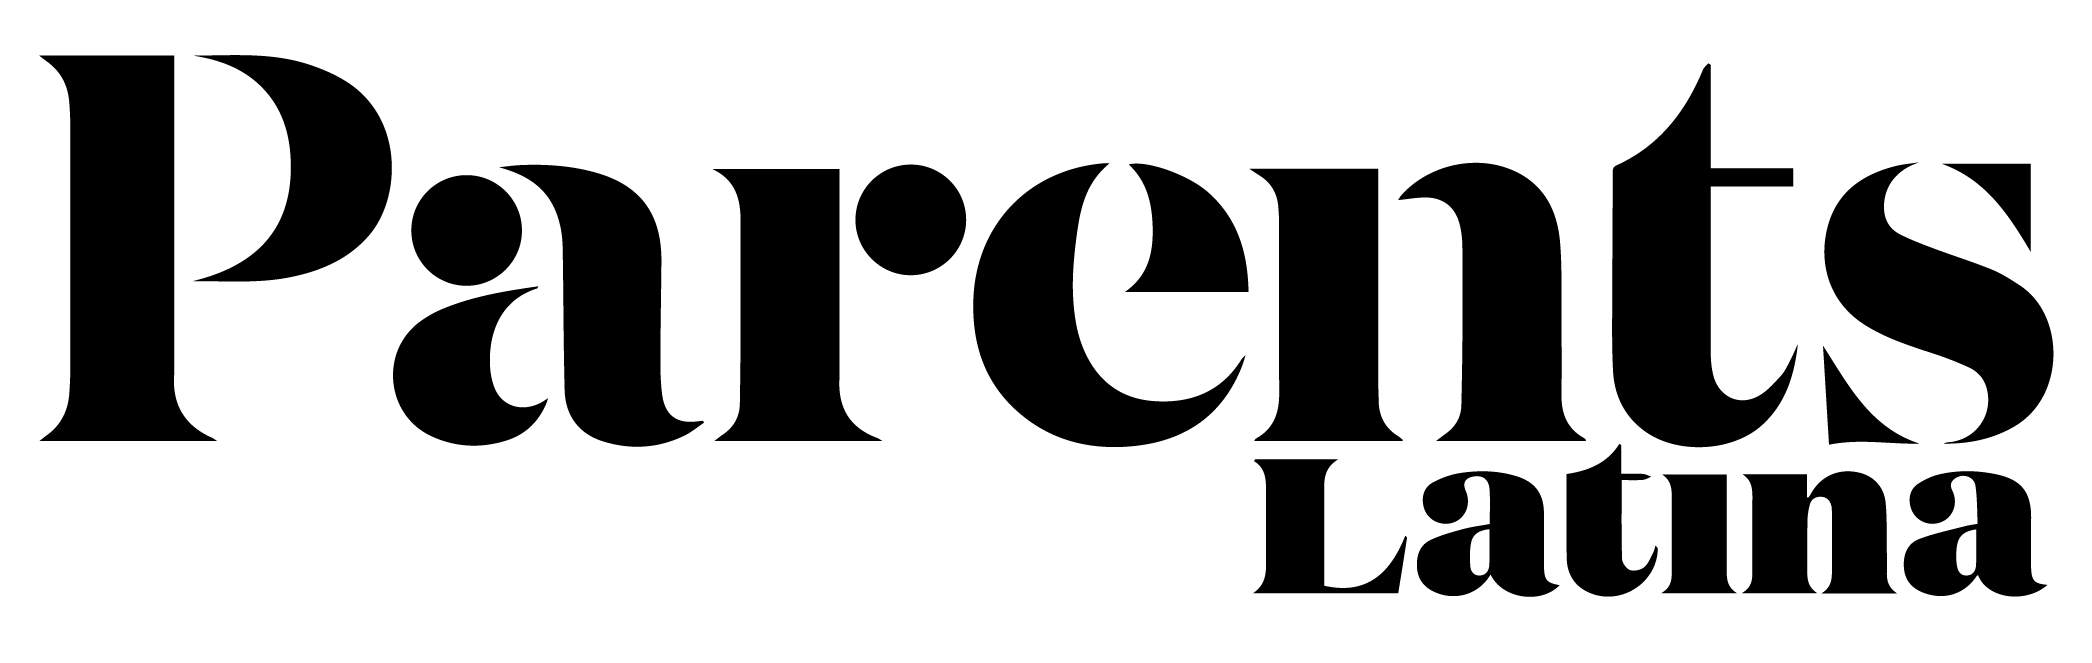 PL_logo_2017-01.png